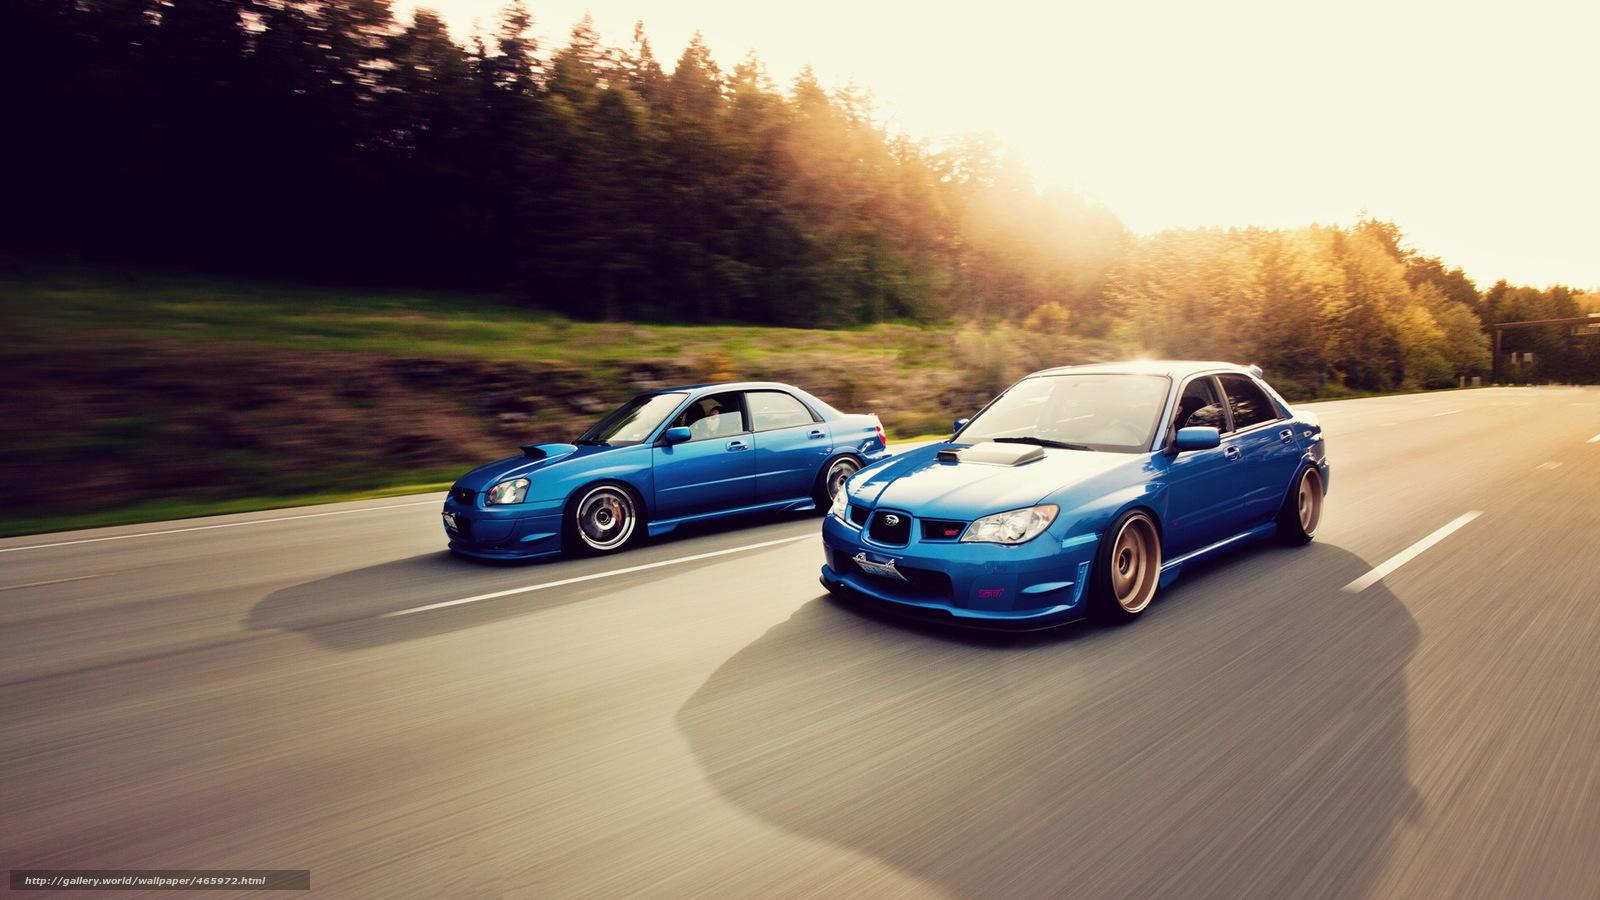 Download Wallpaper Subaru Tuning In Motion Subaru Free